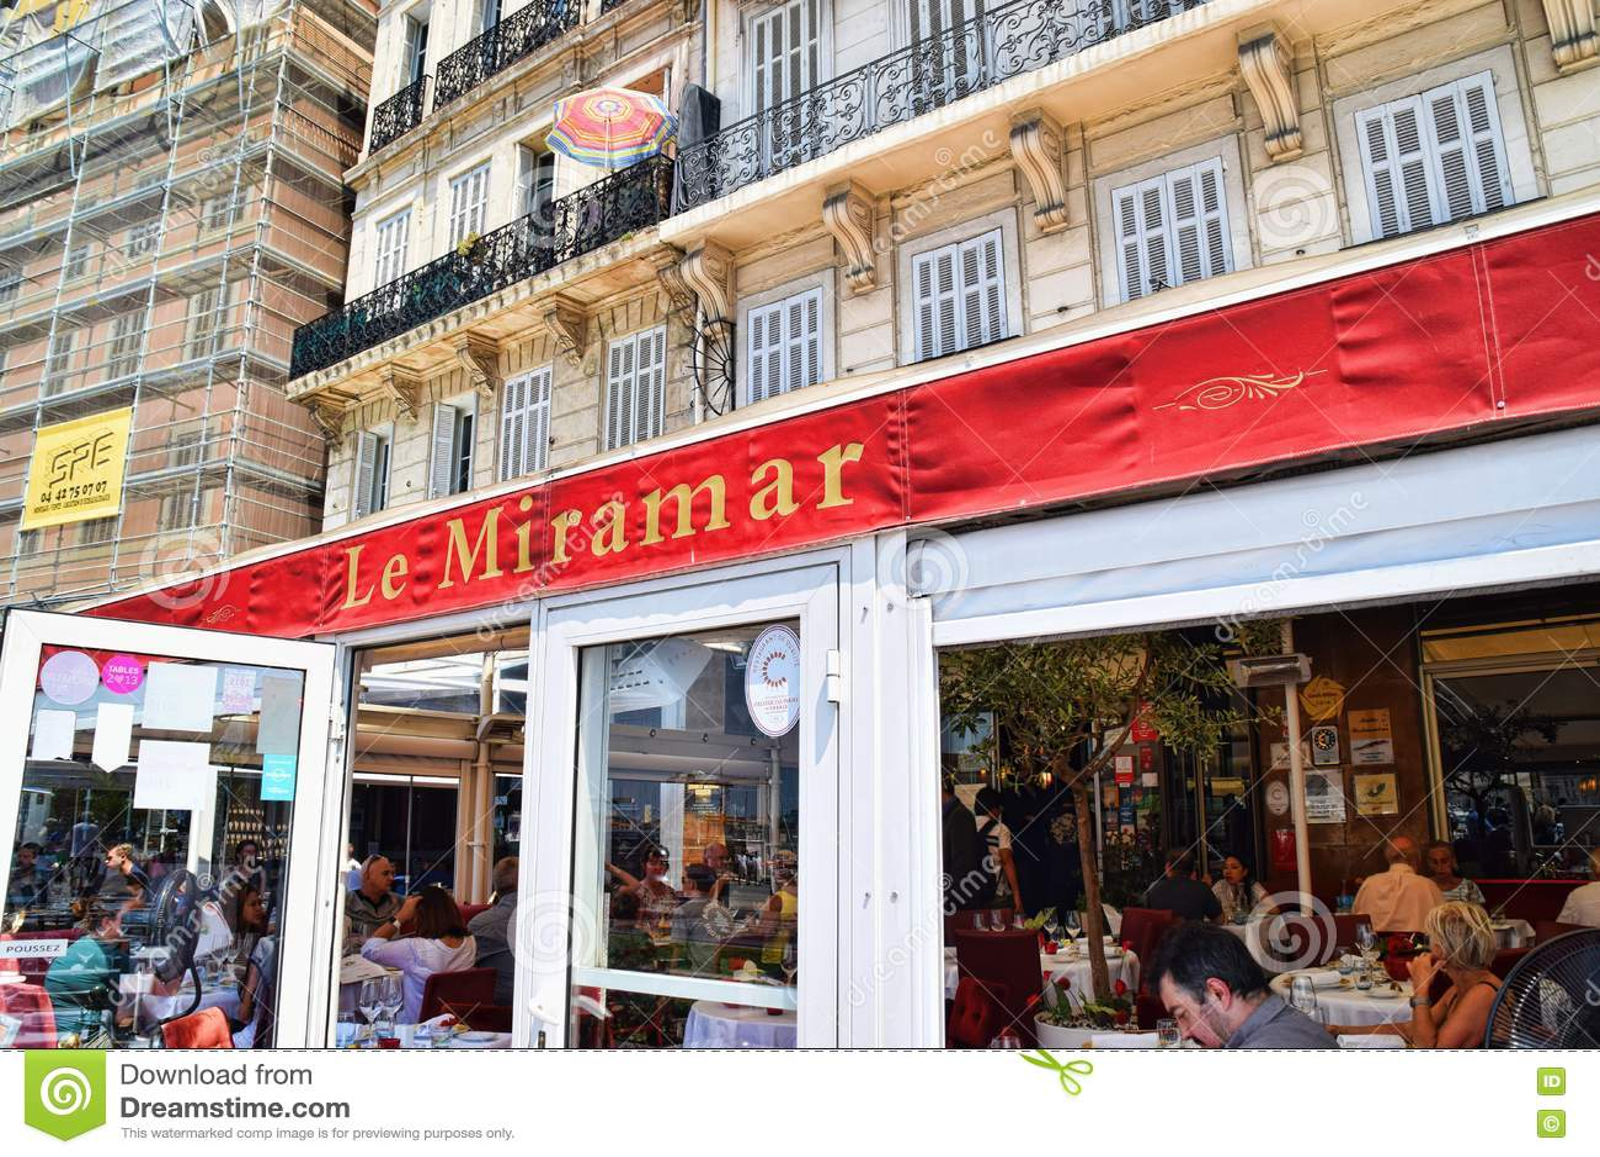 Le Miramar Marseille Editorial Stock Photo Image Of